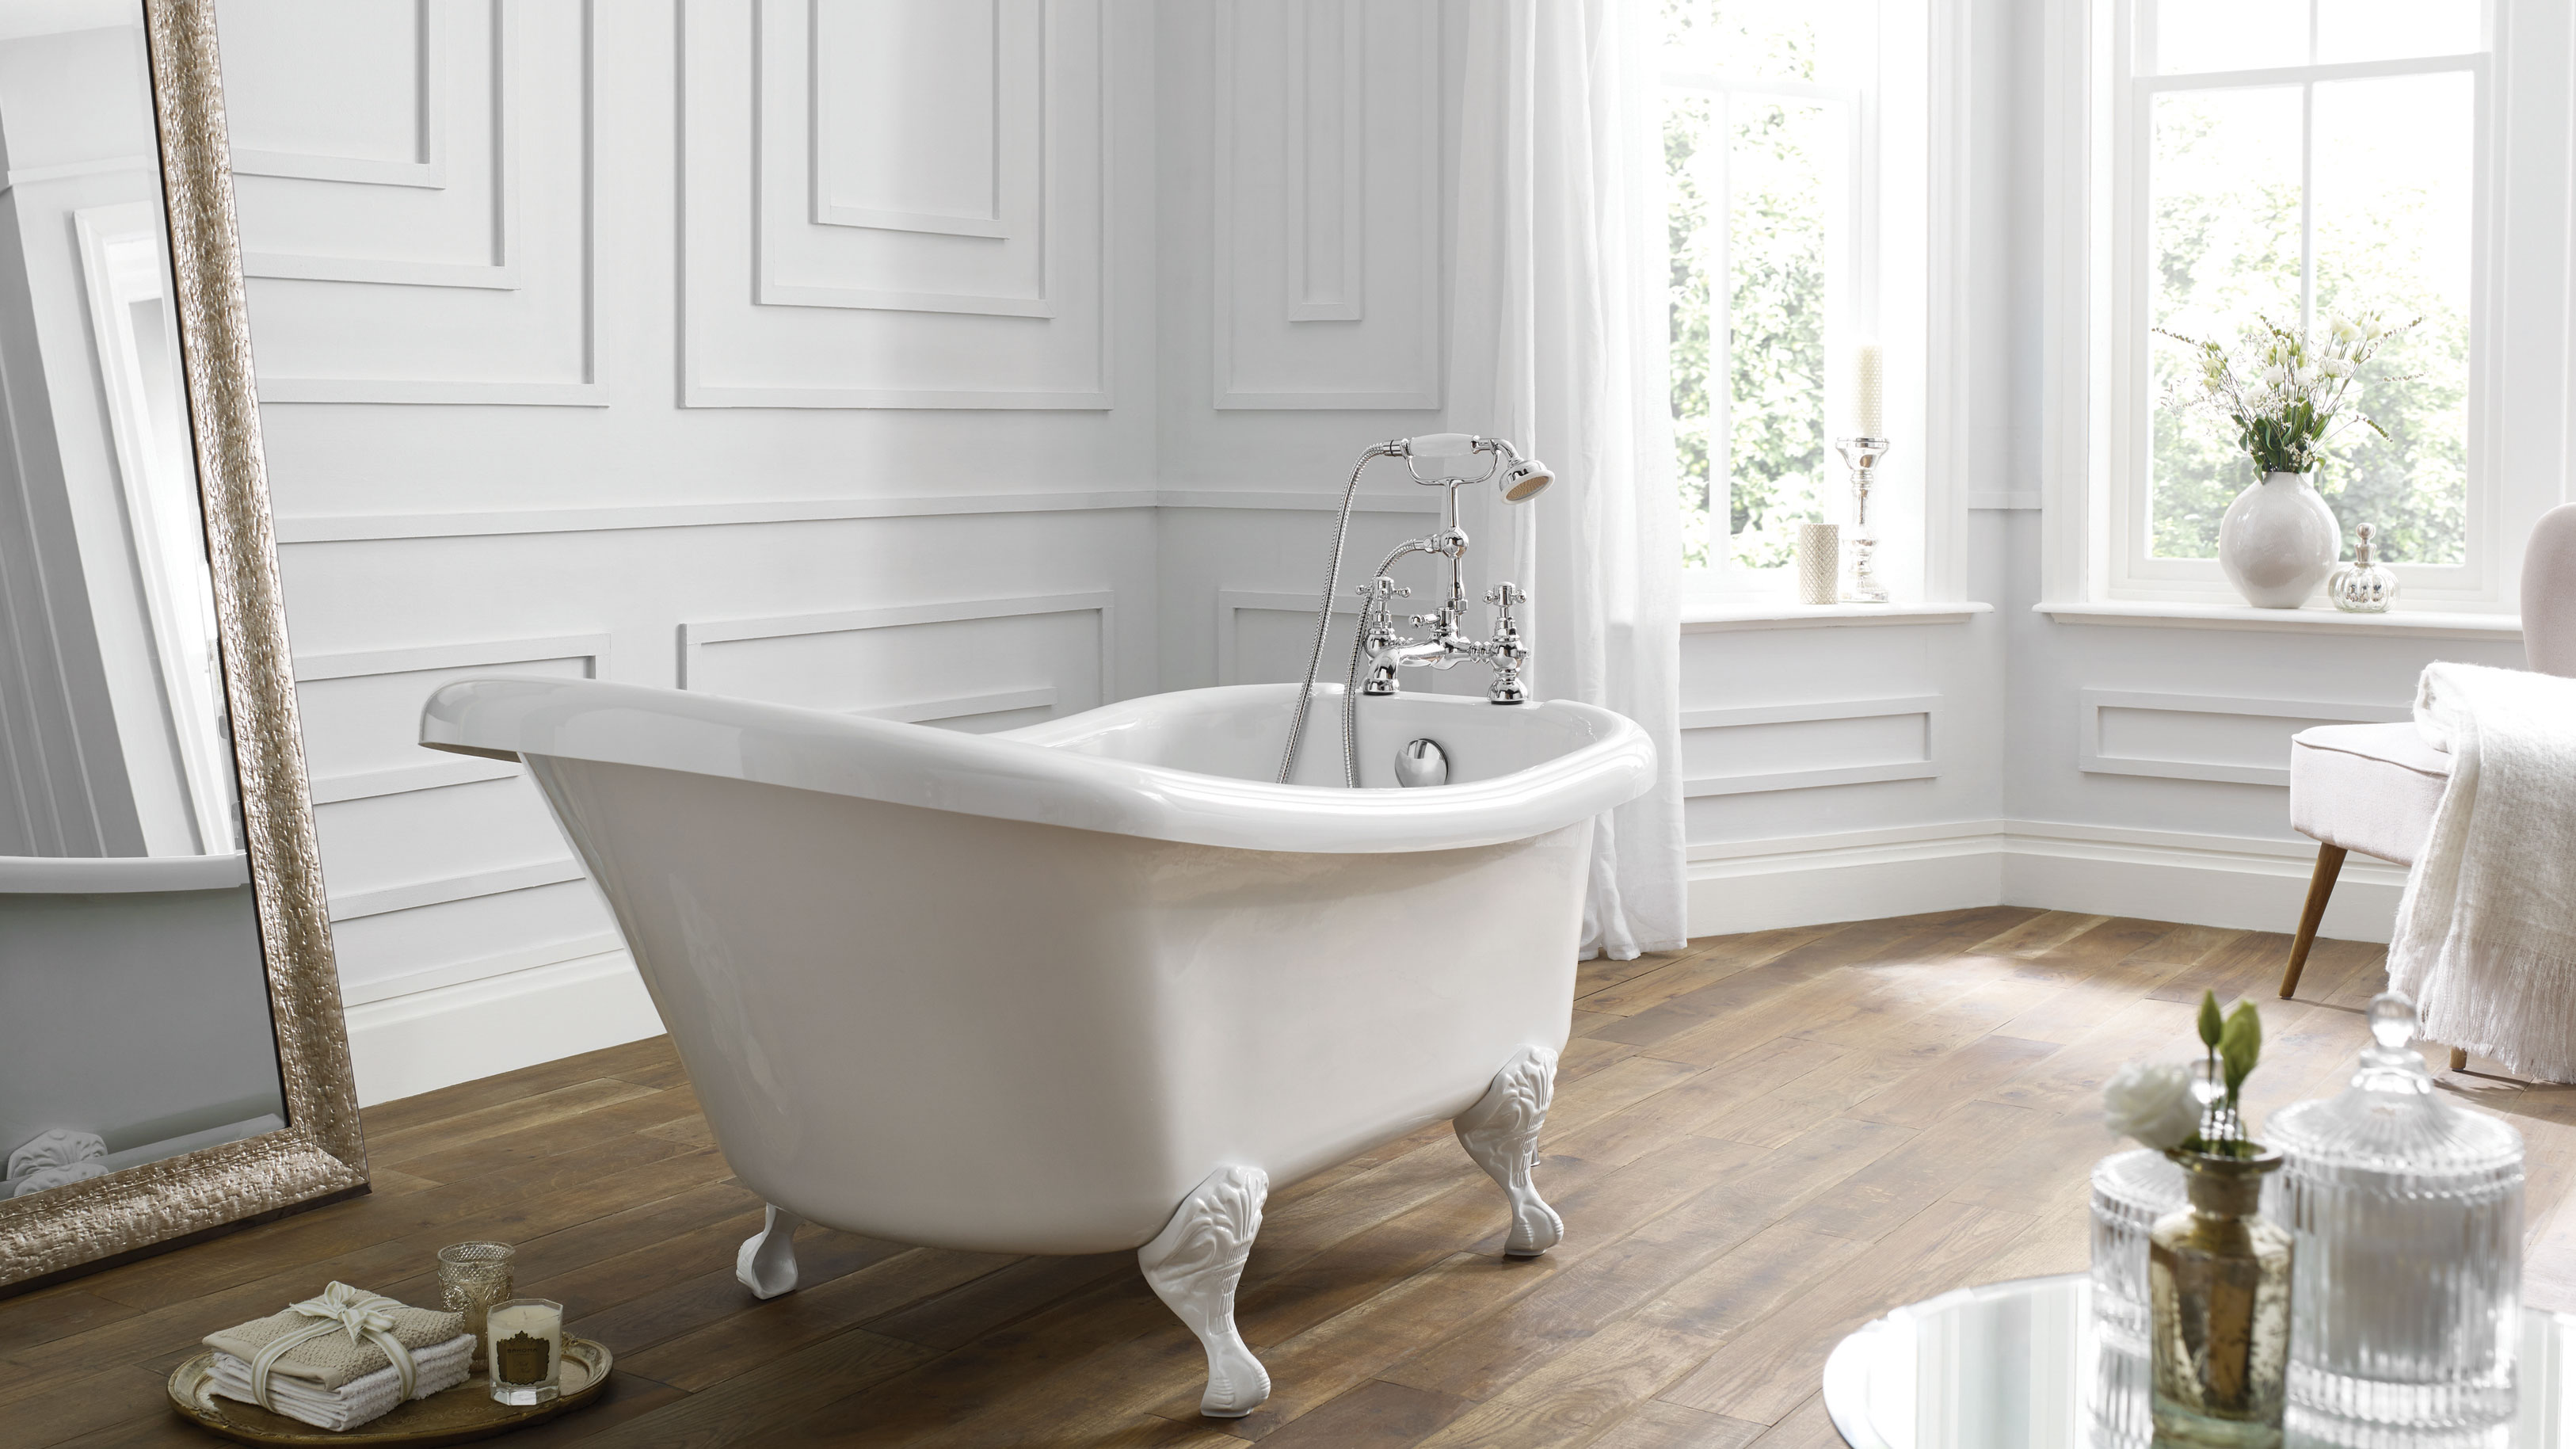 How to create a stylish bathroom on a budget   Real Homes